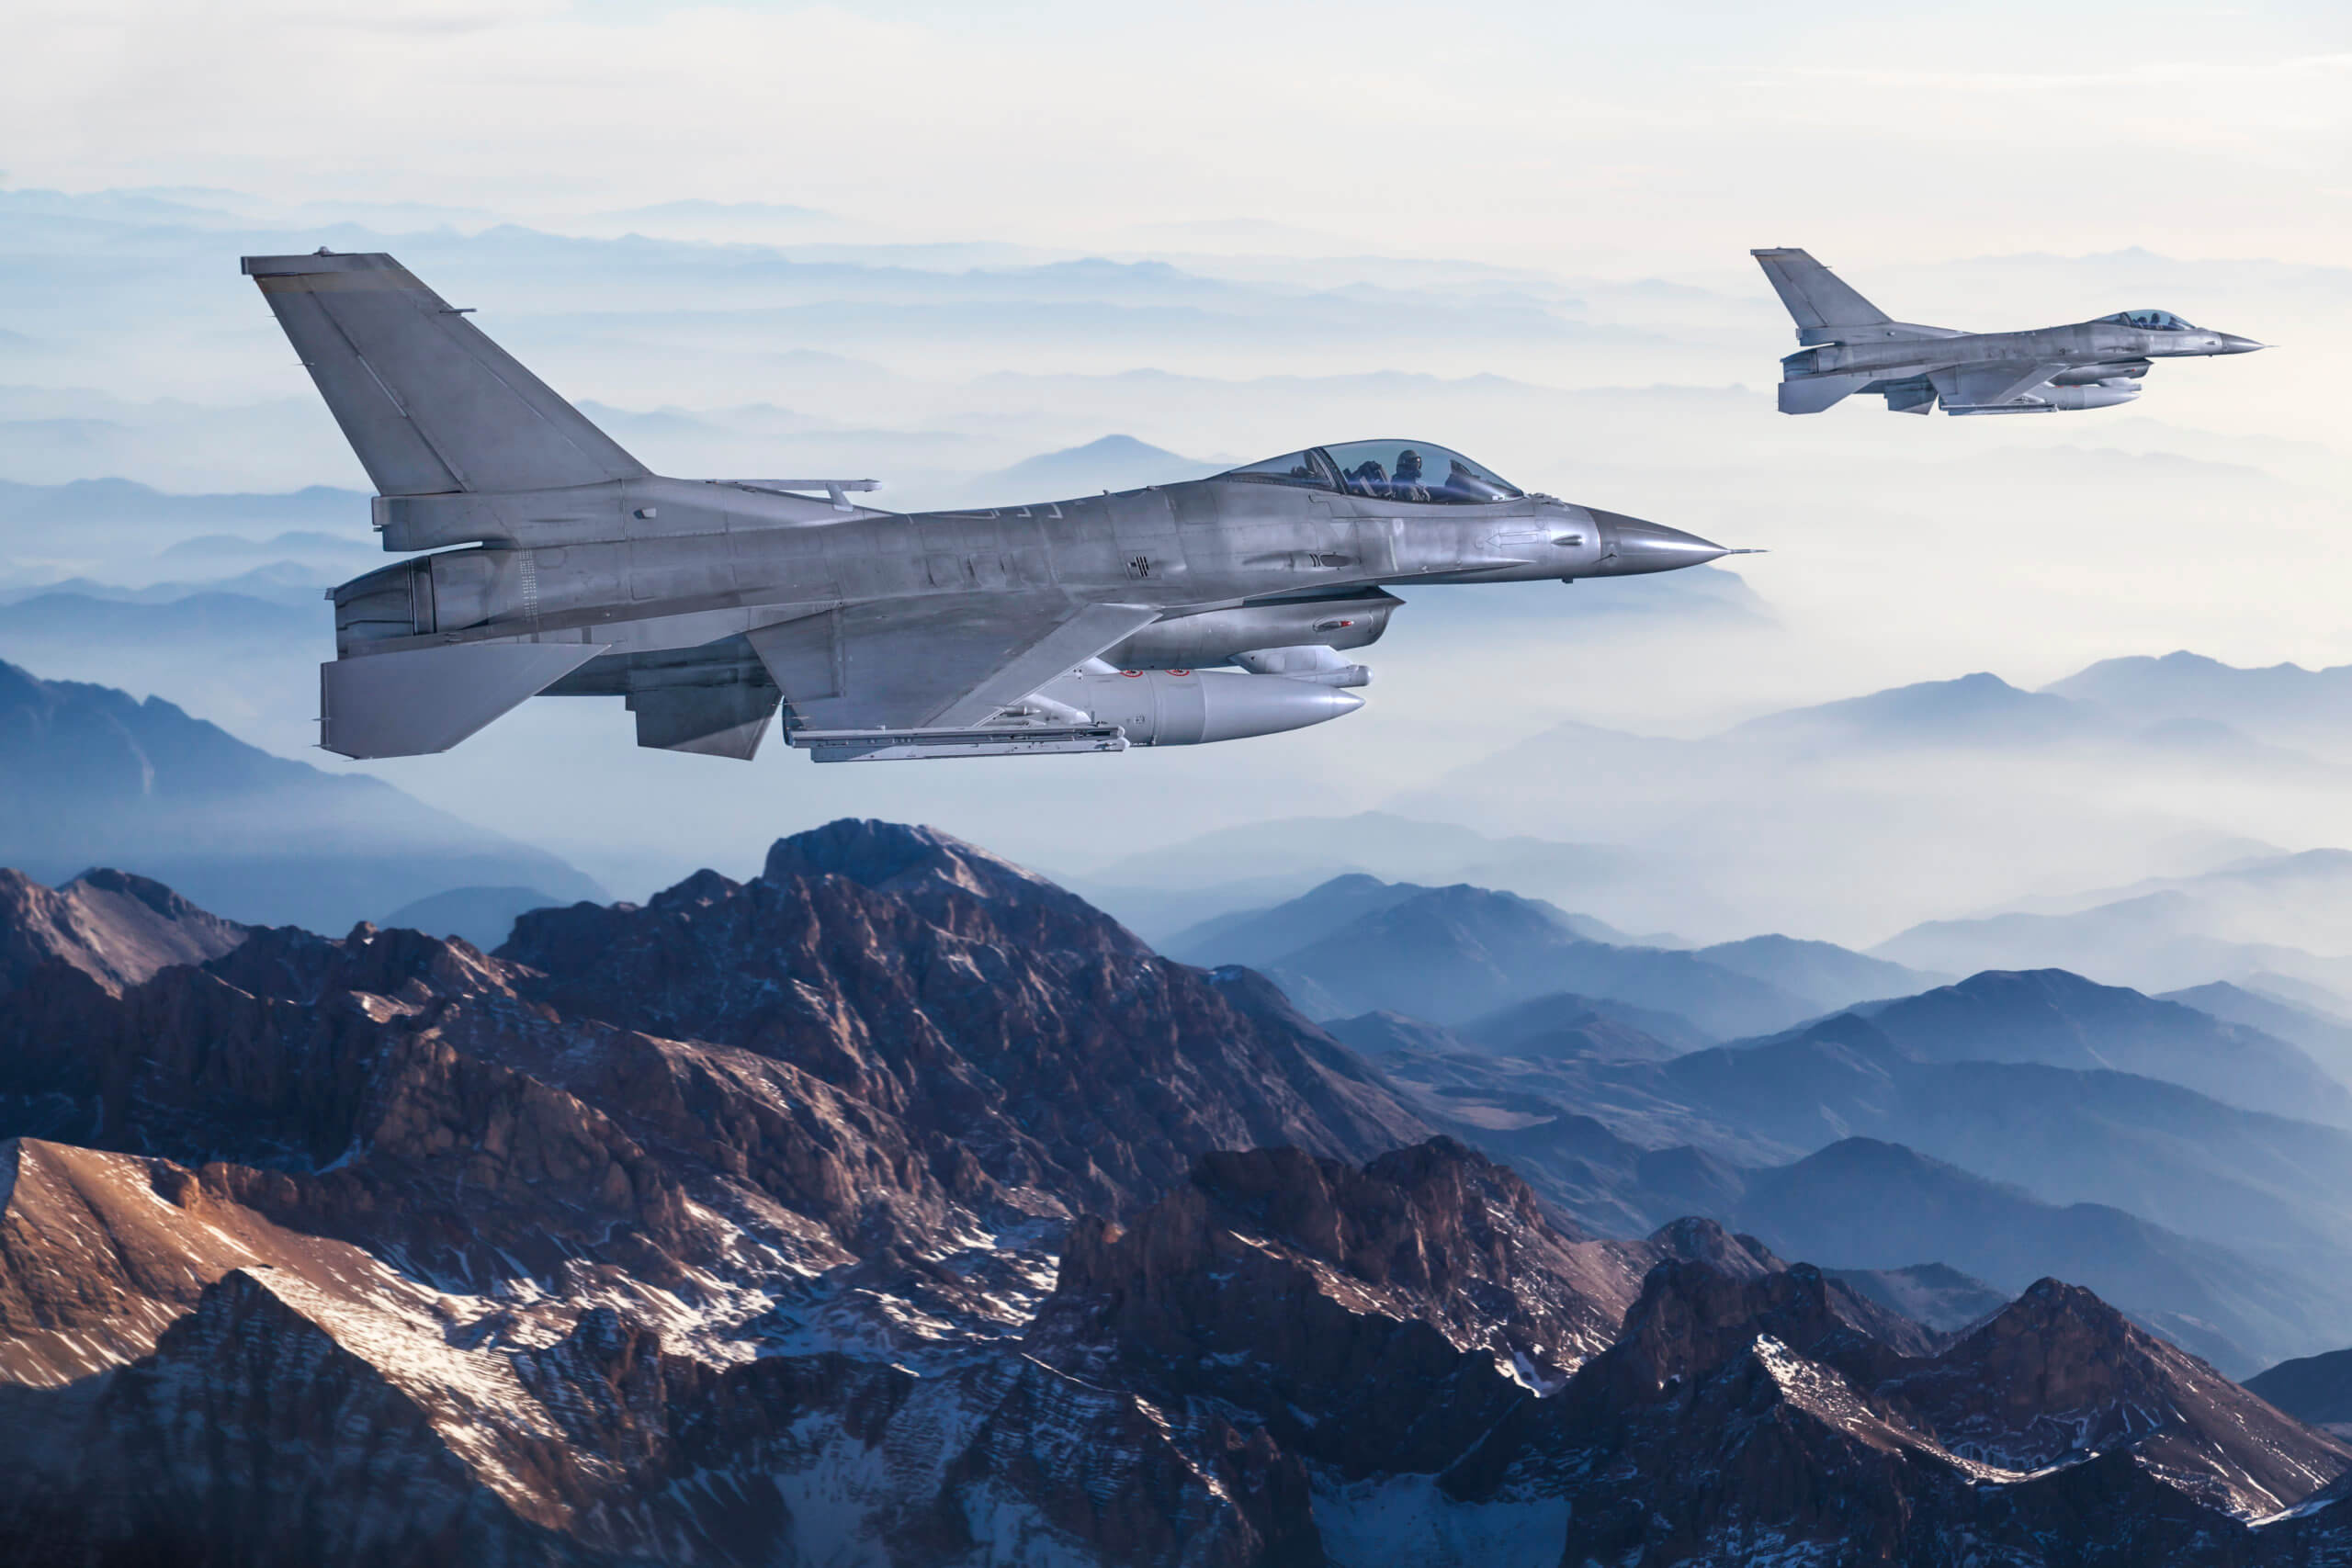 FlexRadio Announces Strategic Partnership with Raytheon